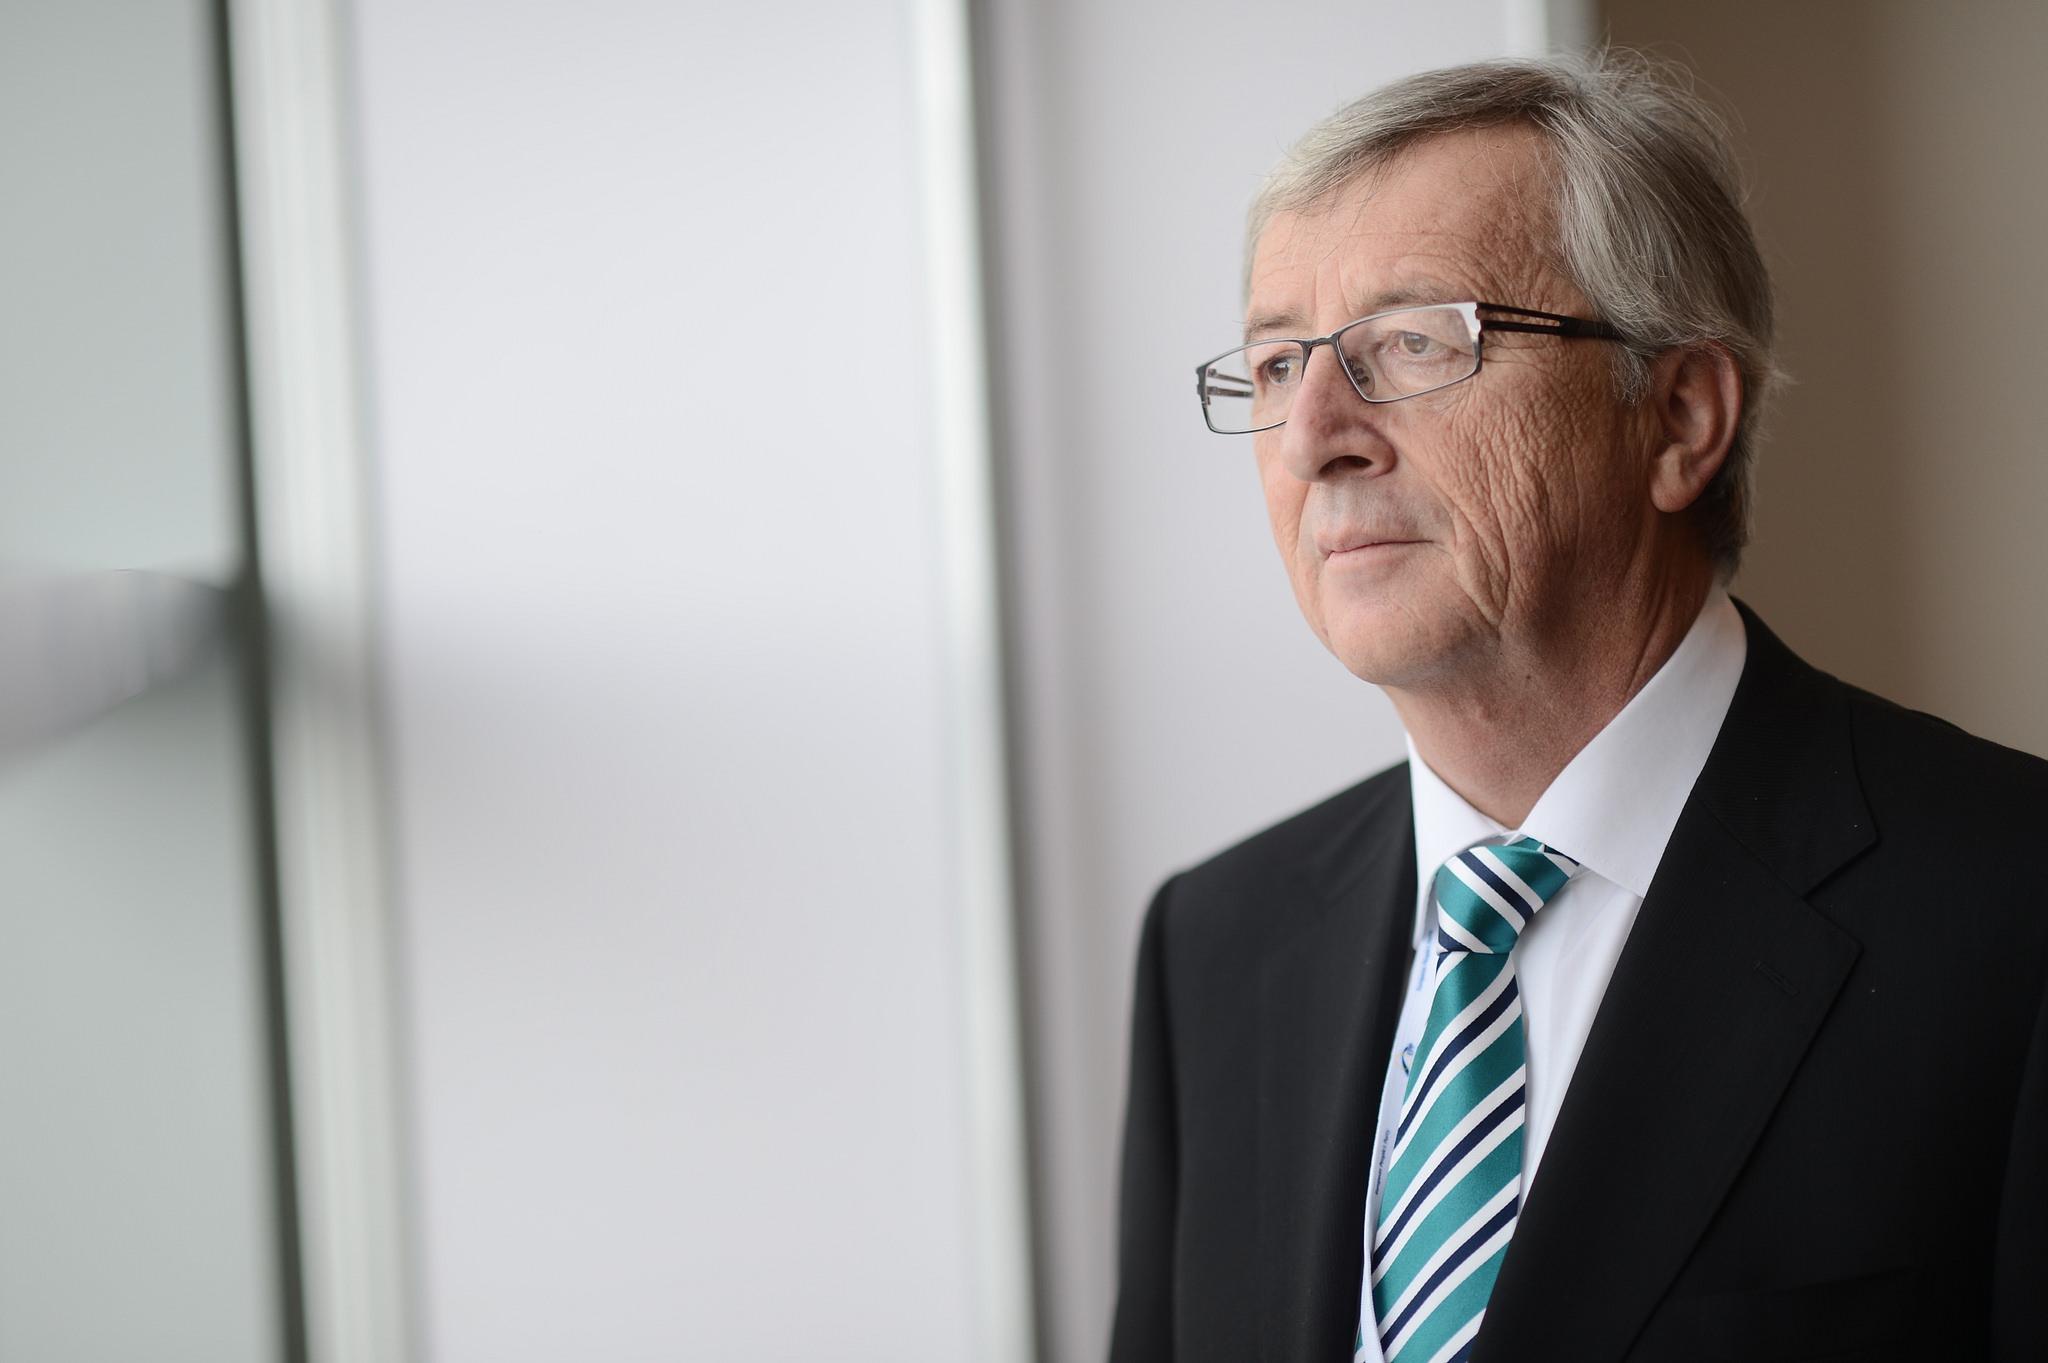 Jean_Claude_Juncker_European_People's_Party